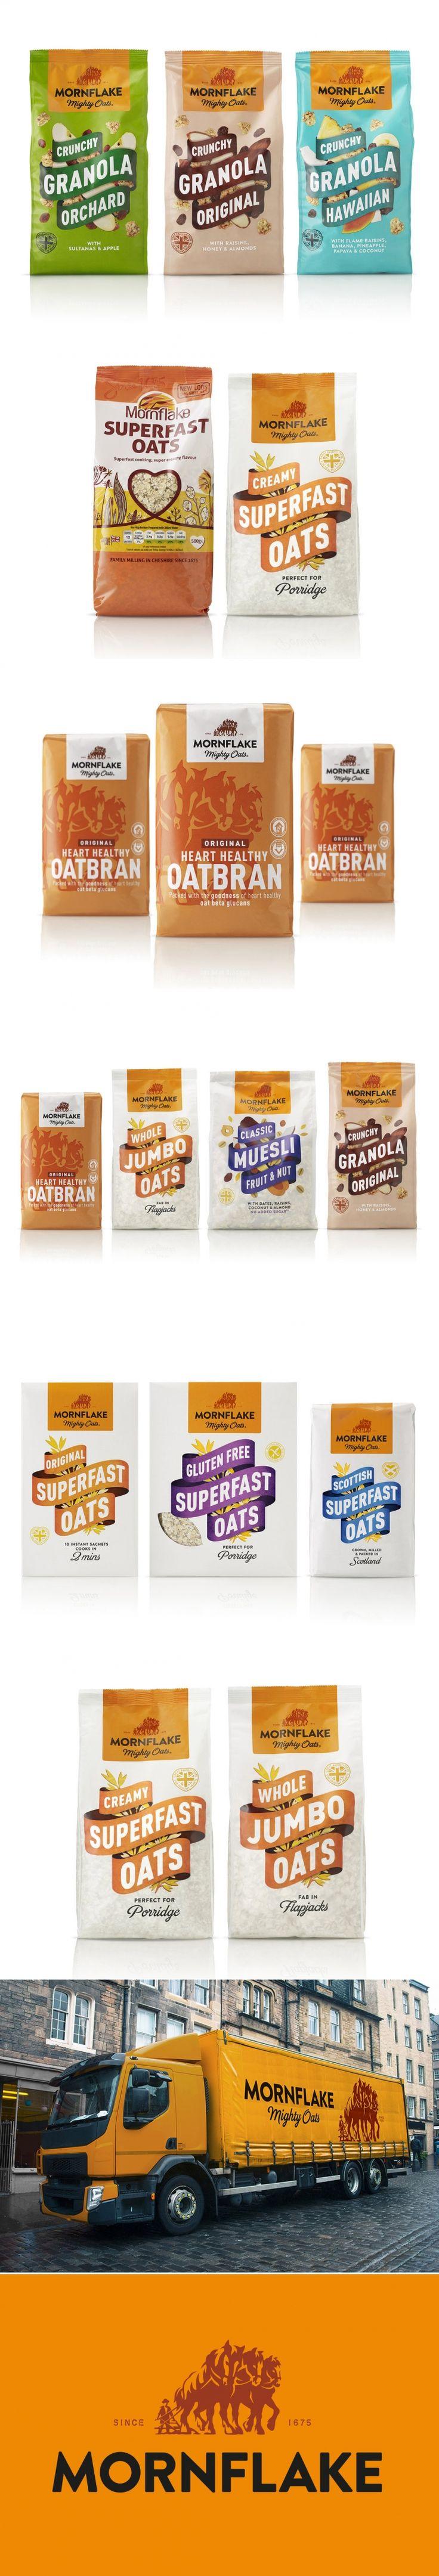 British Favorite Mornflake Gets a Dynamic New Look — The Dieline   Packaging & Branding Design & Innovation News